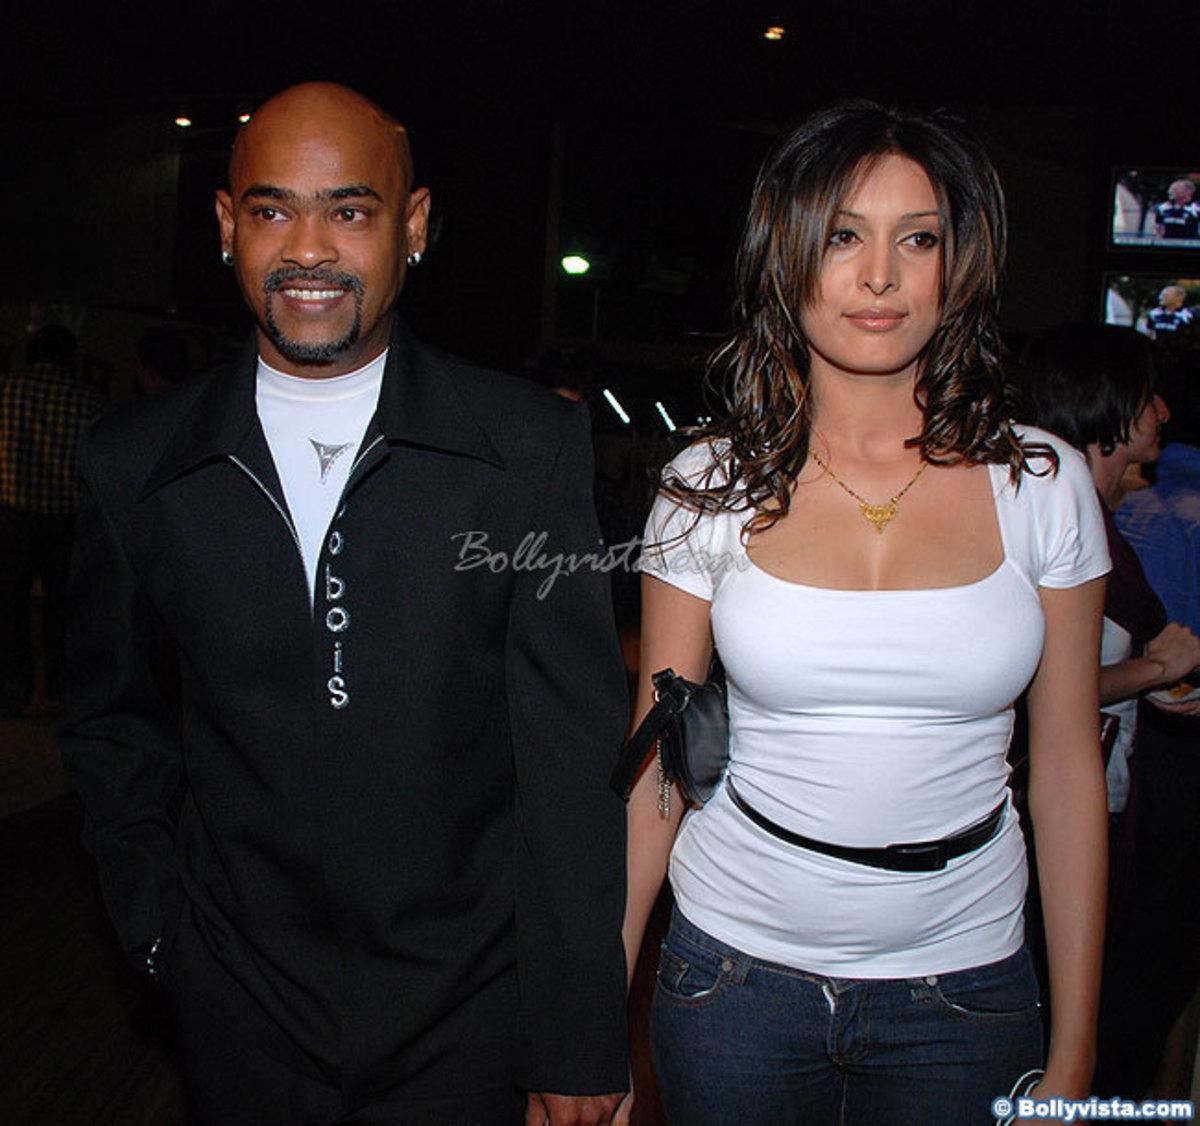 Vinod Kambli and his wife Andrea